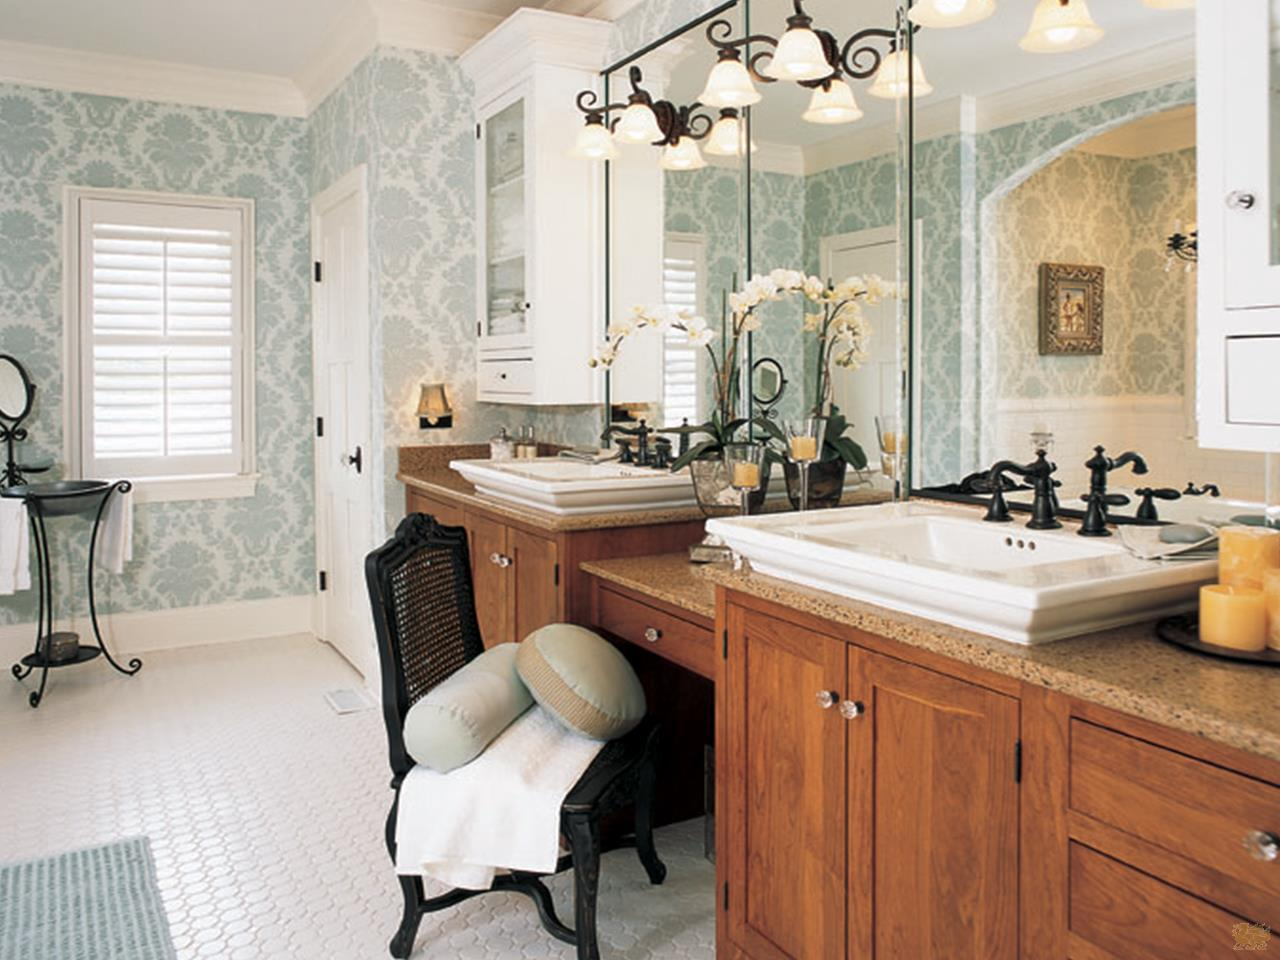 Global Bathrooms Floform Countertops